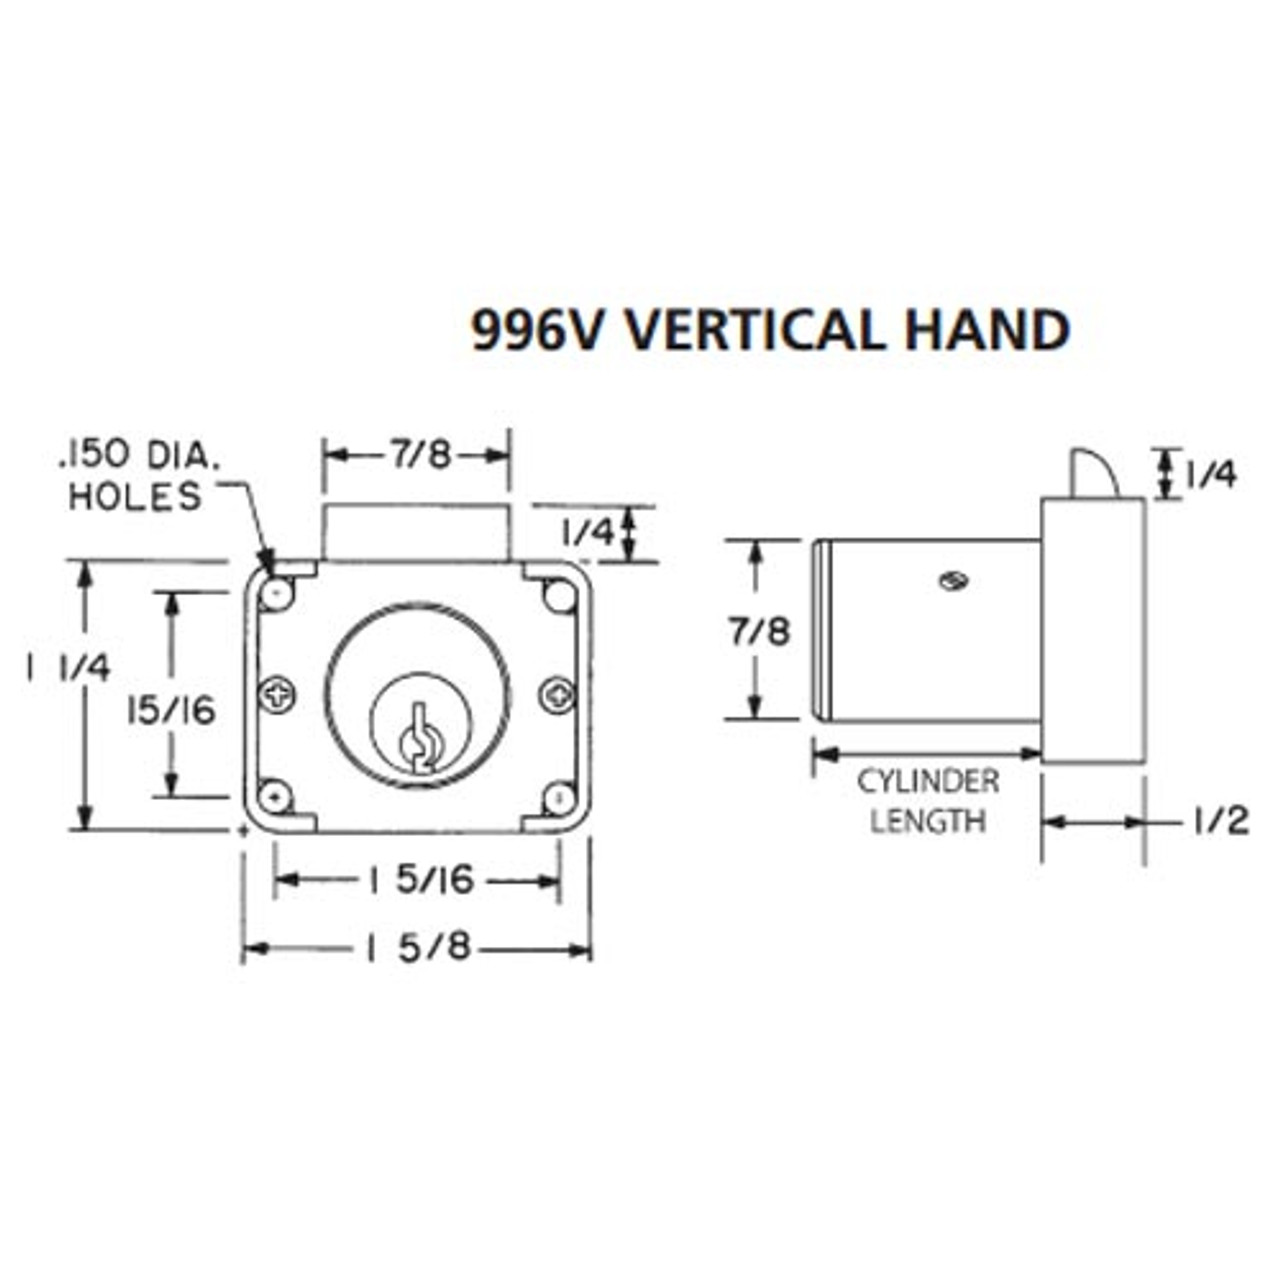 Olympus 996V-VH-KA4T3-26D-7/8 R Series Vertical Handing Cabinet Drawer Latch Lock in Satin Chrome